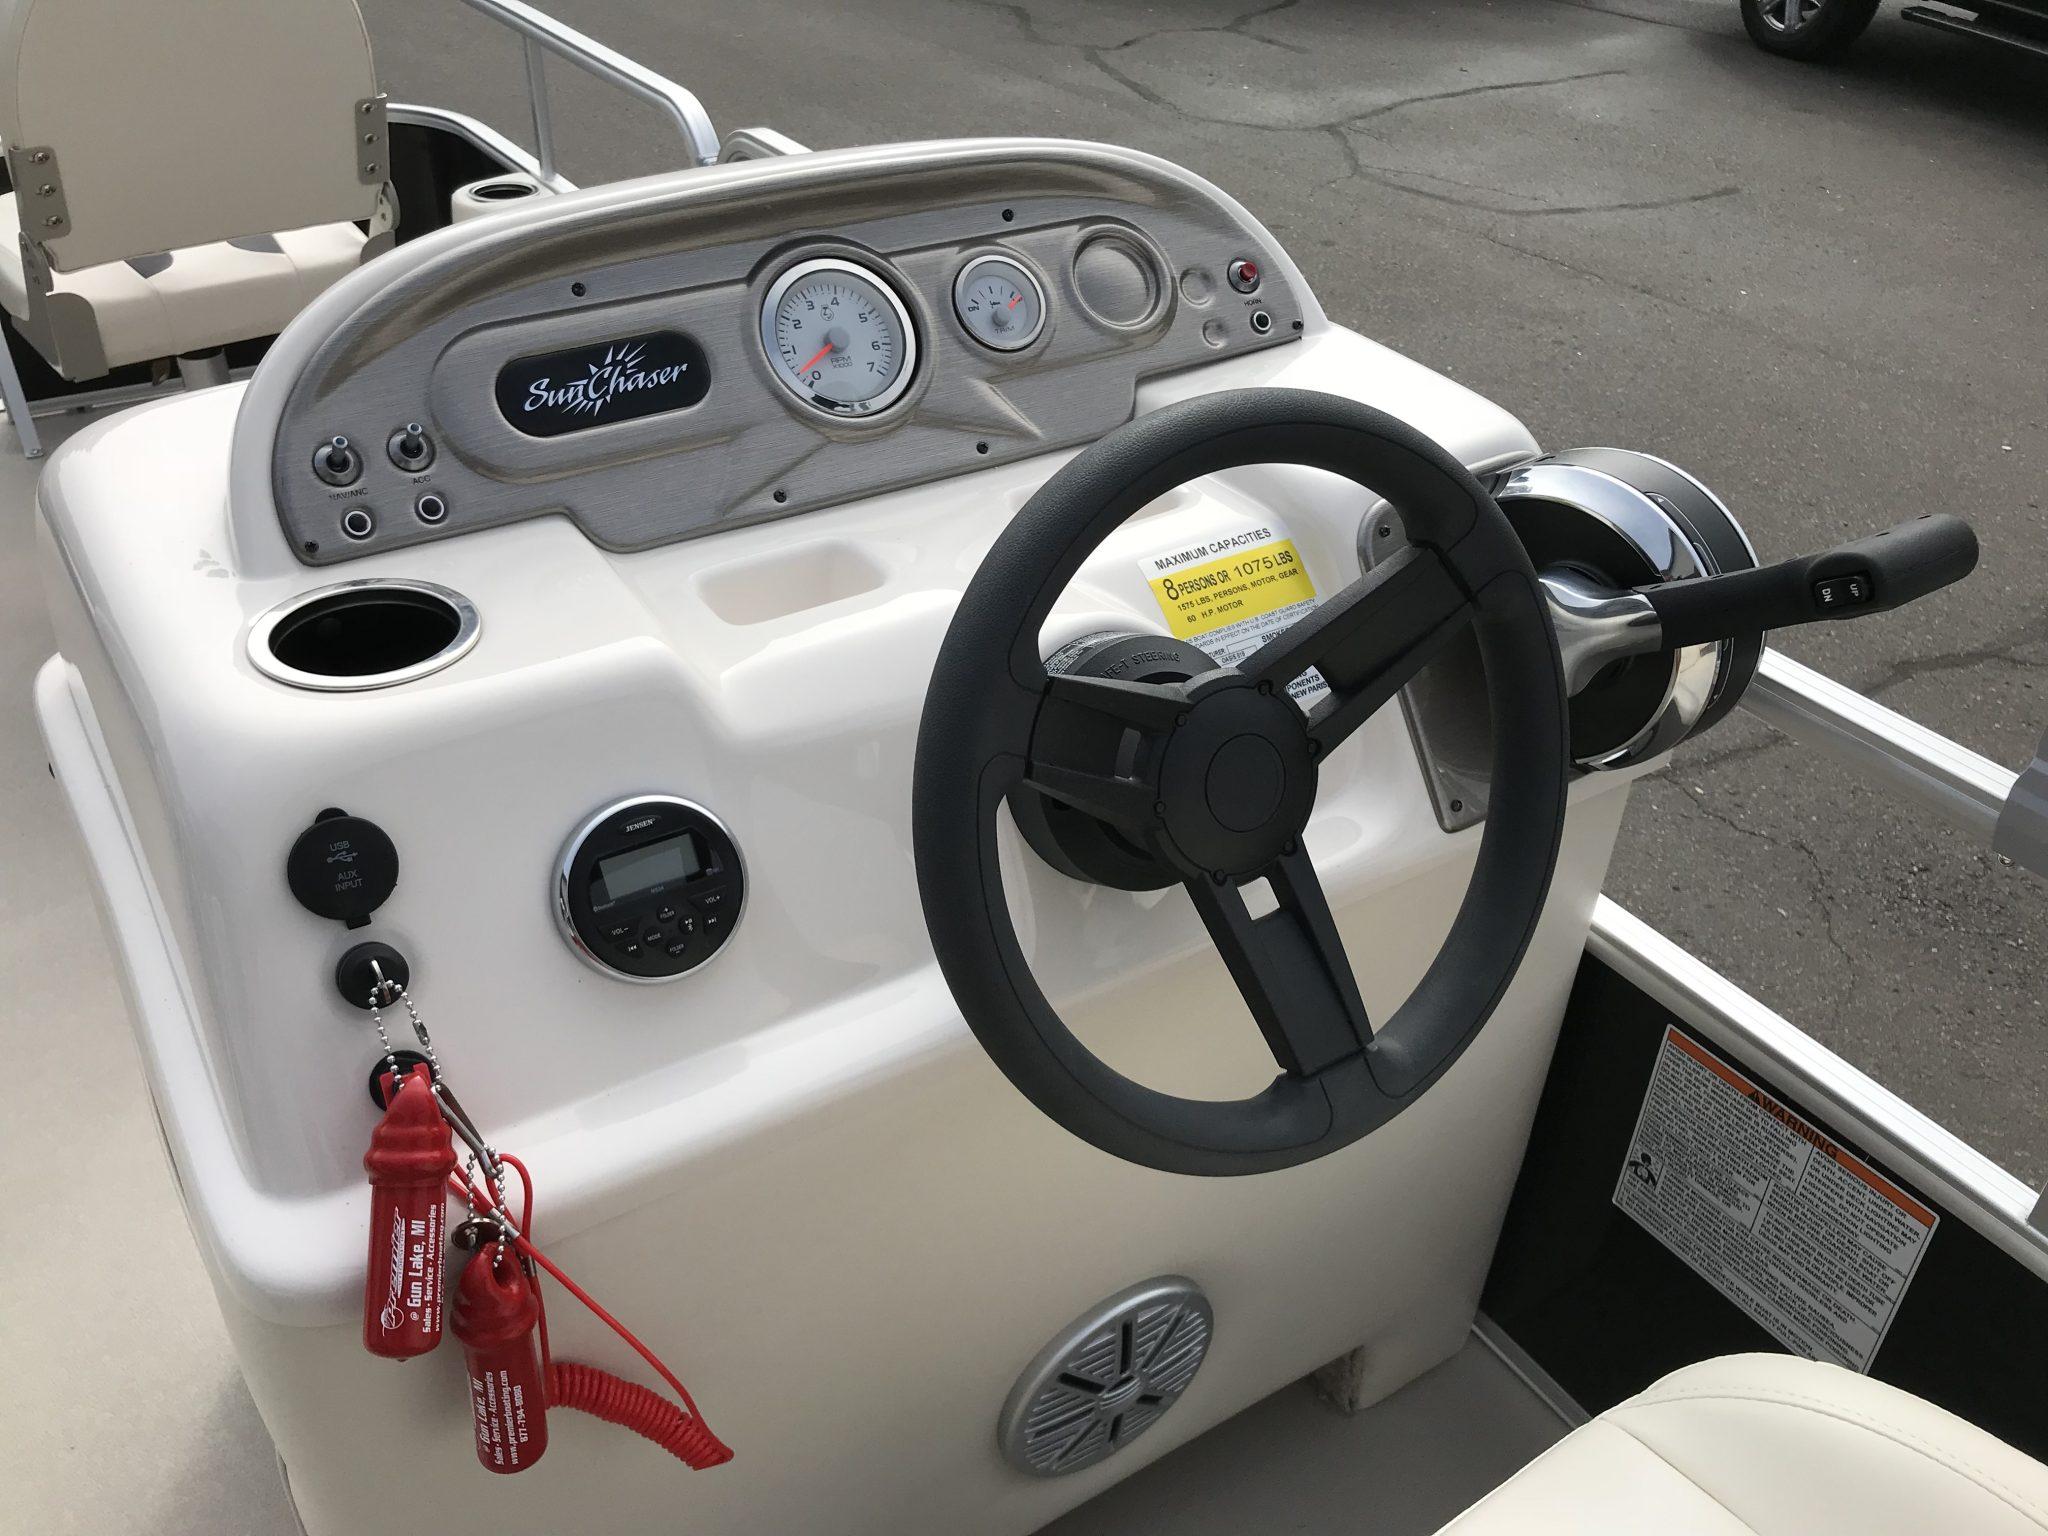 2019 SunChaser 818 4.0 Helm And Steering Wheel